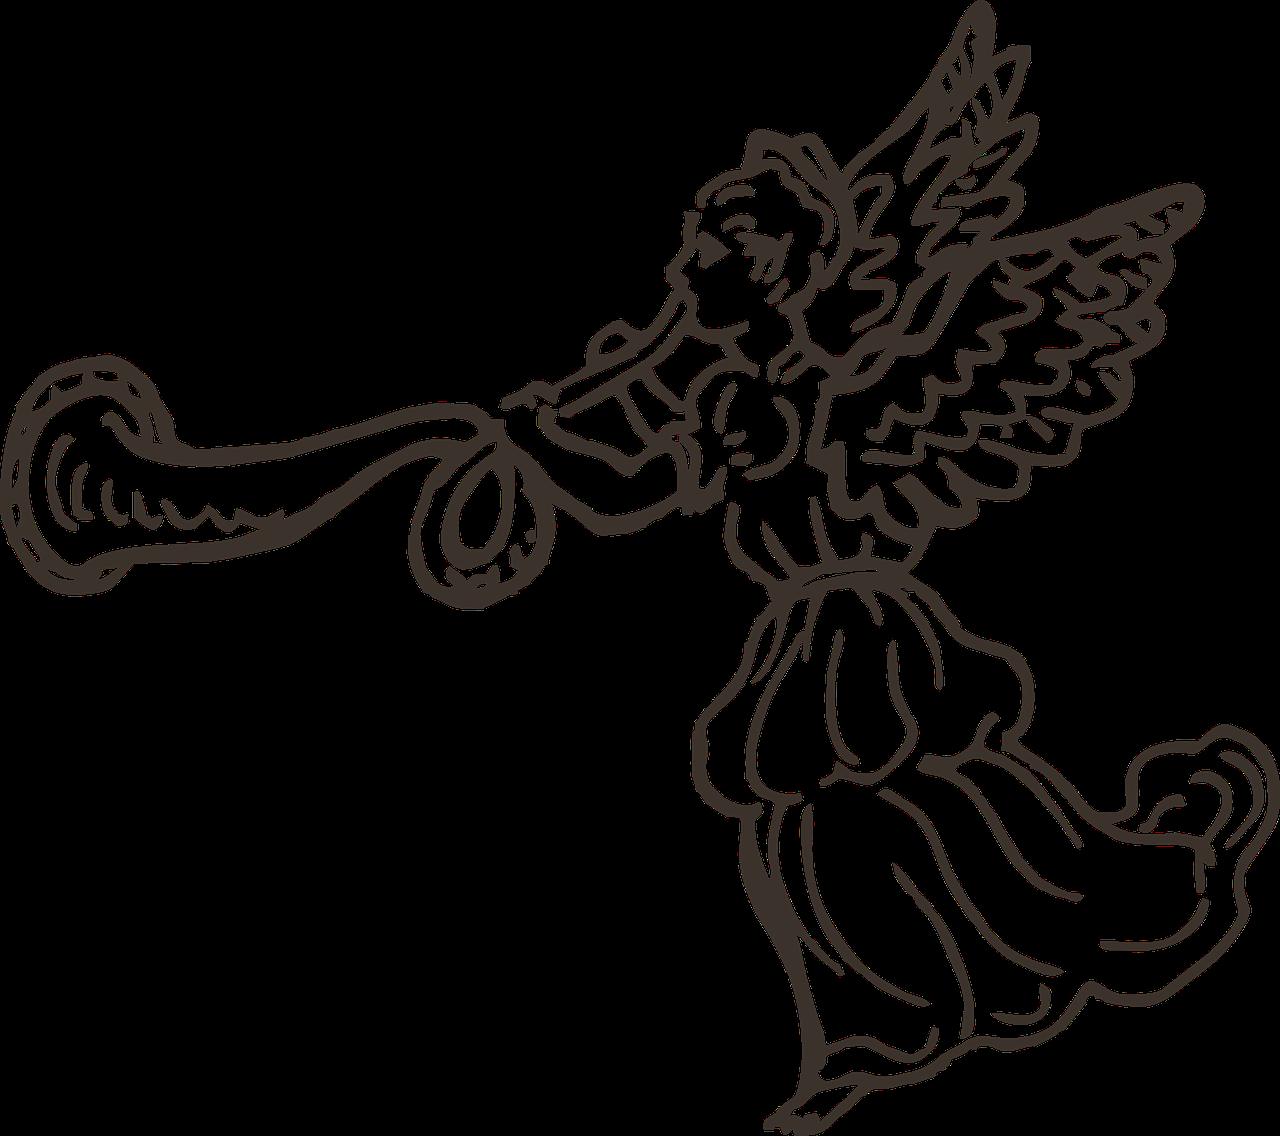 заключенный картинки трубящий ангел шкаф